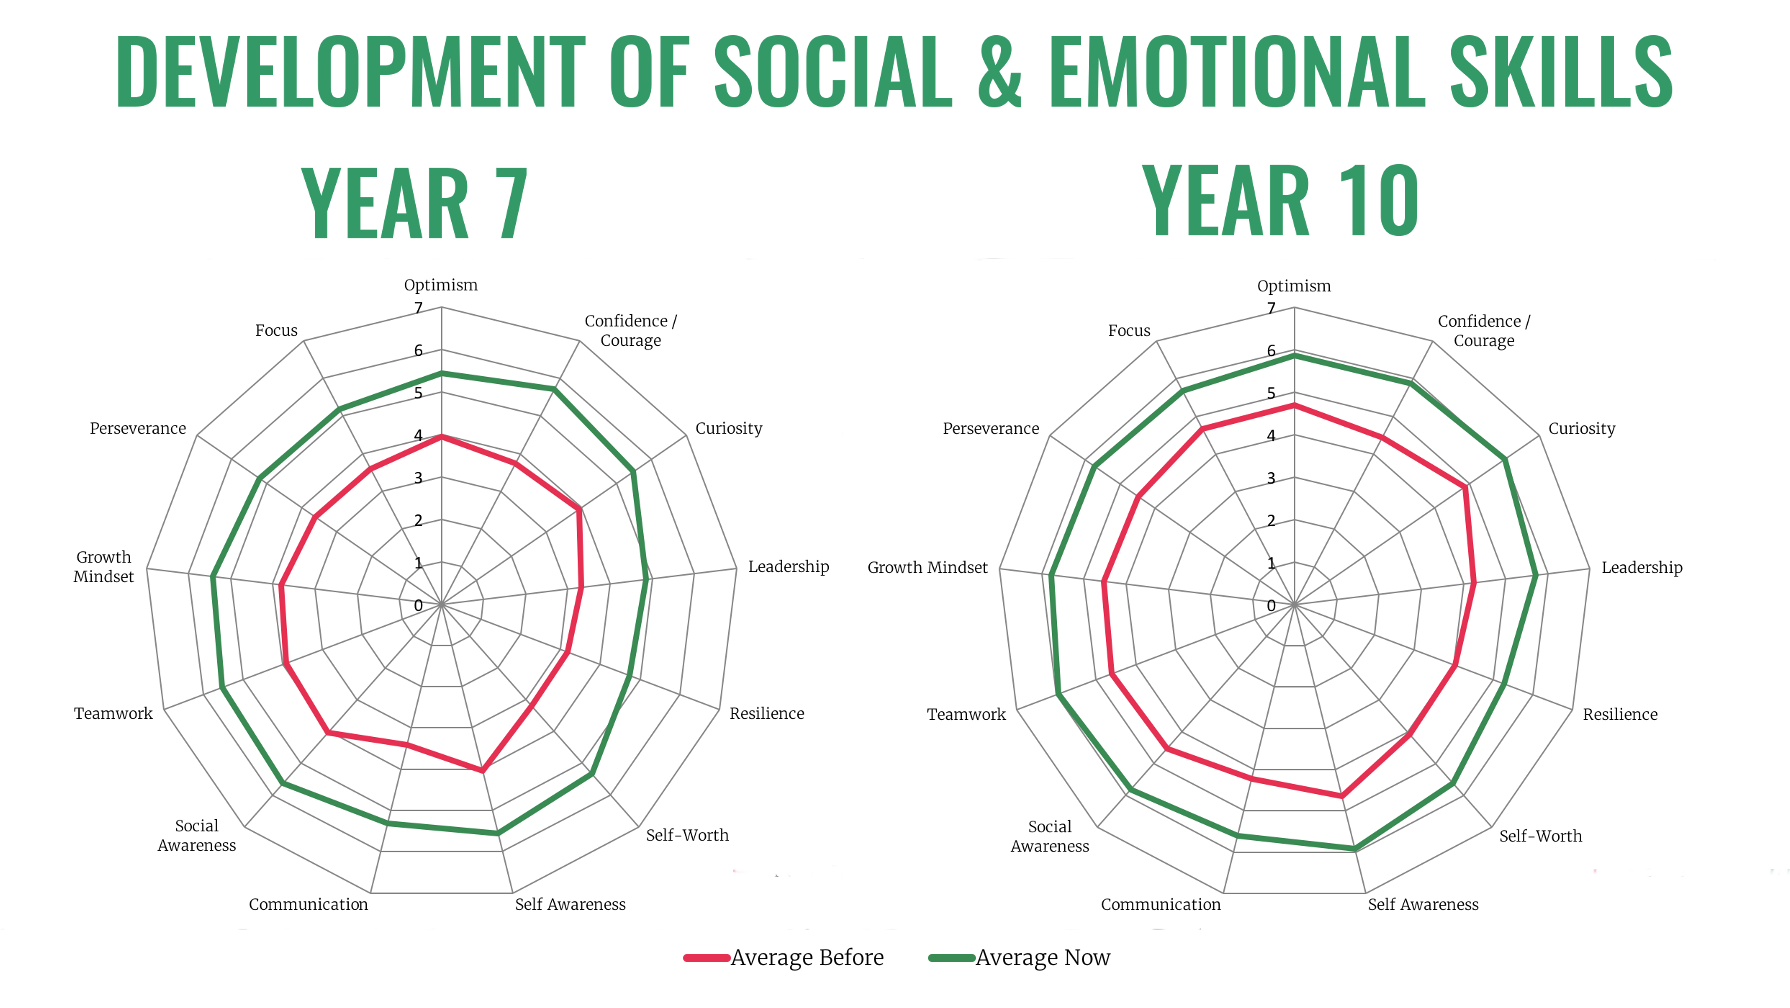 Development of Key Social and Emotional Skills